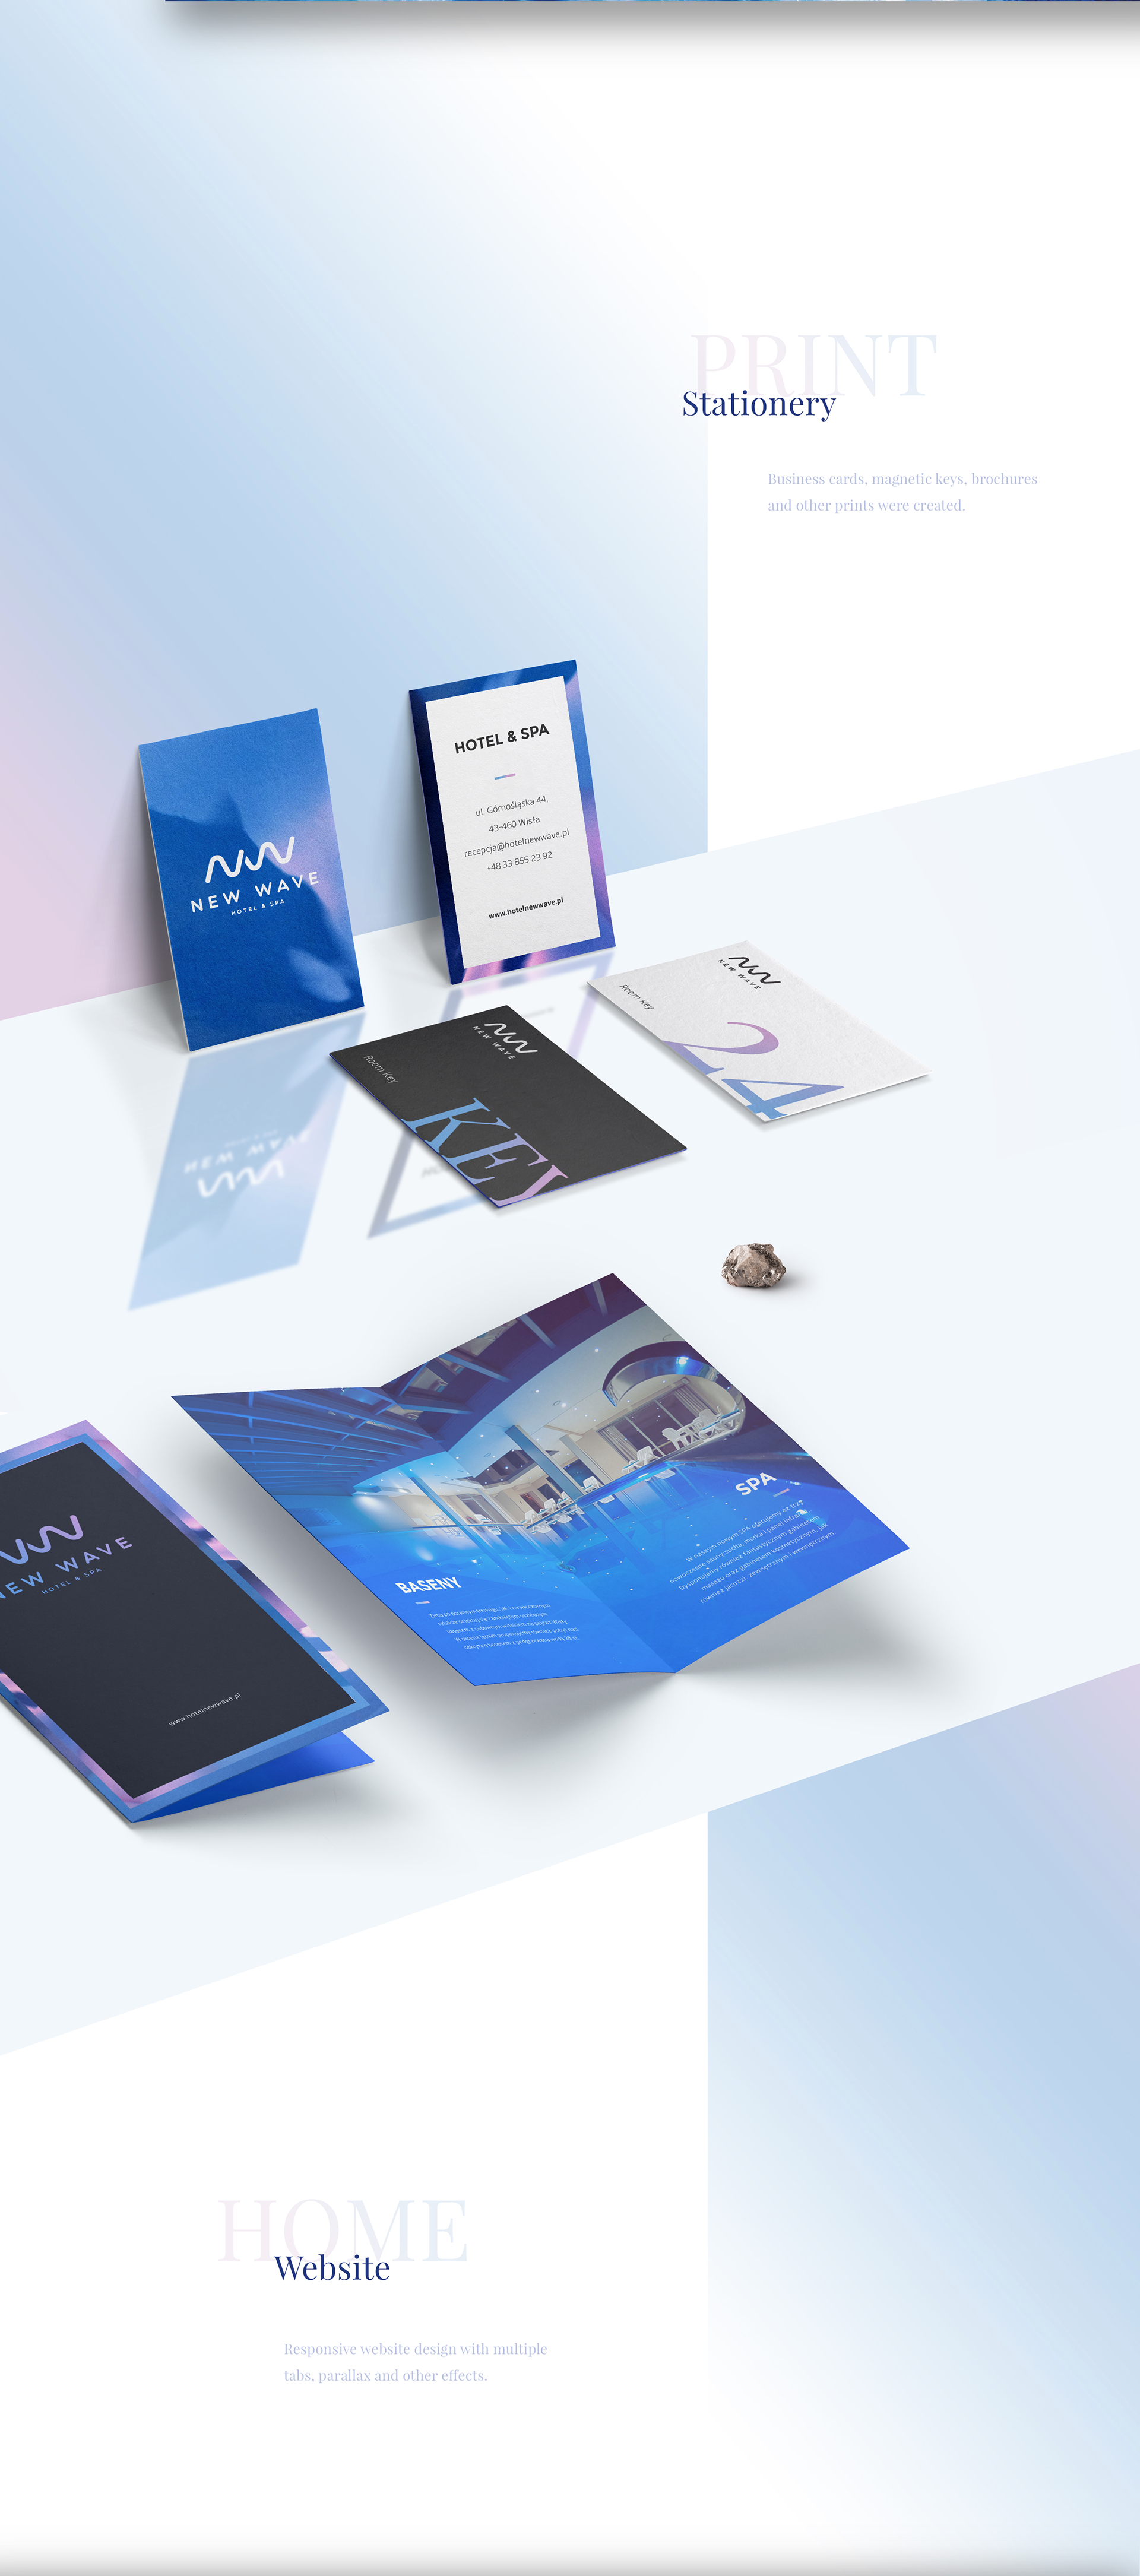 Web Design & UI/UX: New Wave Hotel & Spa